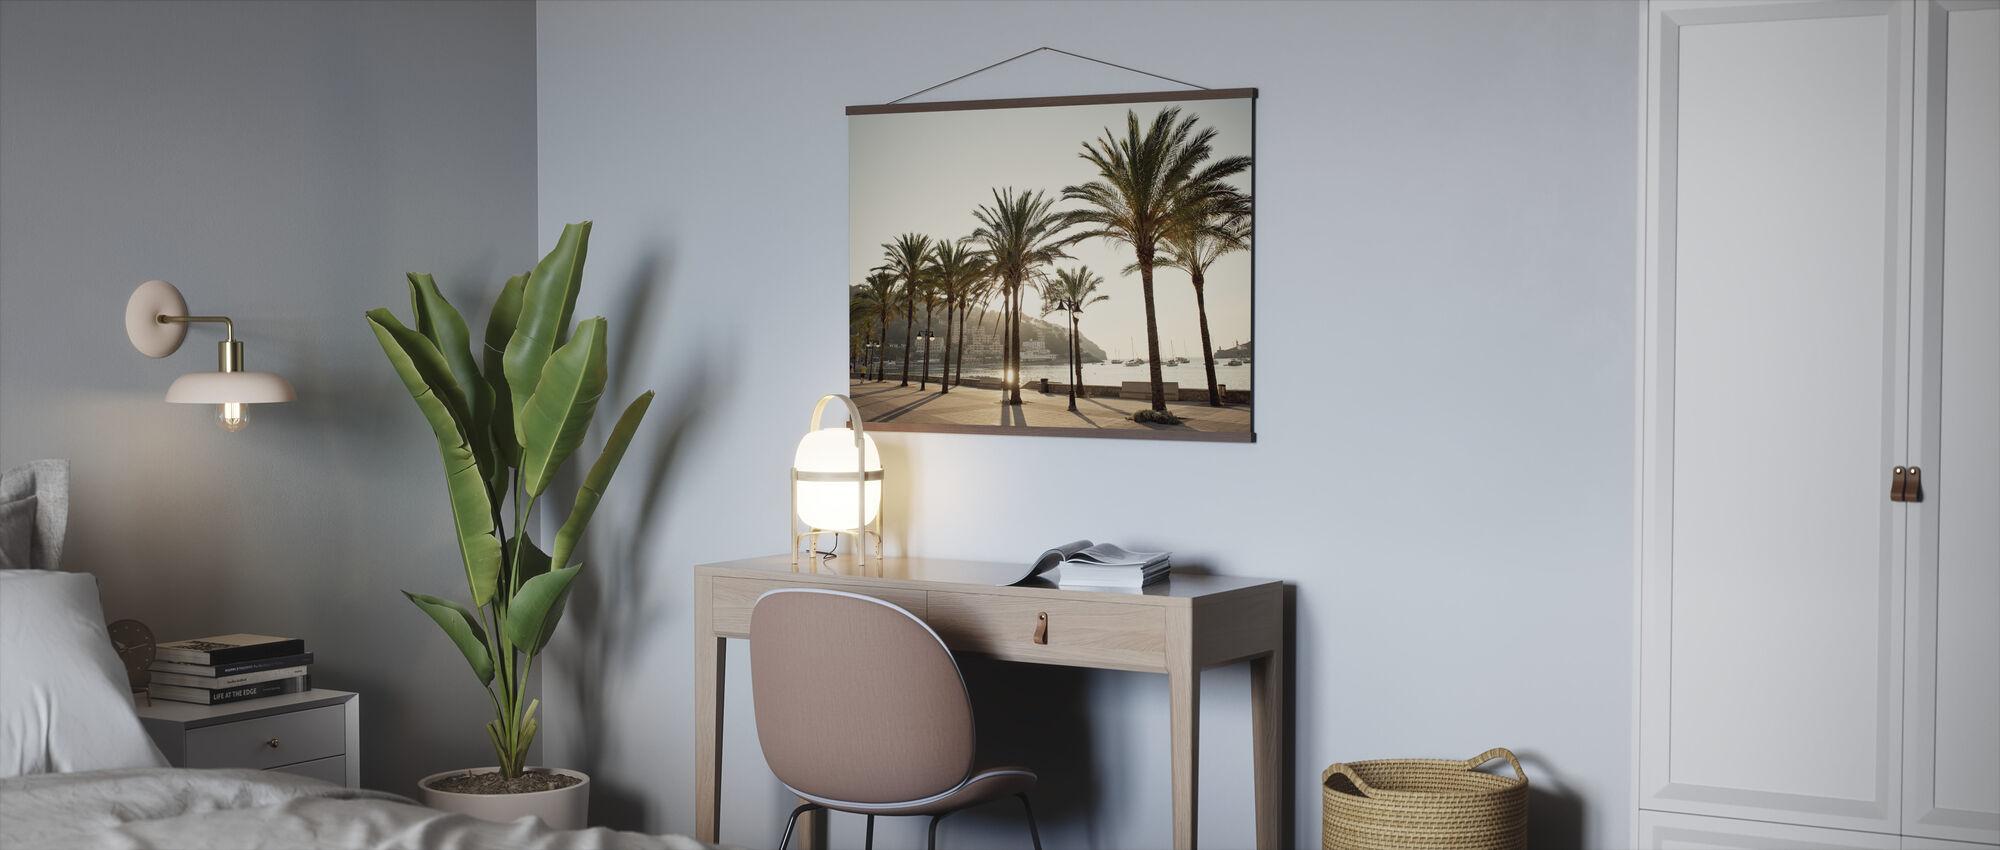 Mallorca Boardwalk - Plakat - Kontor